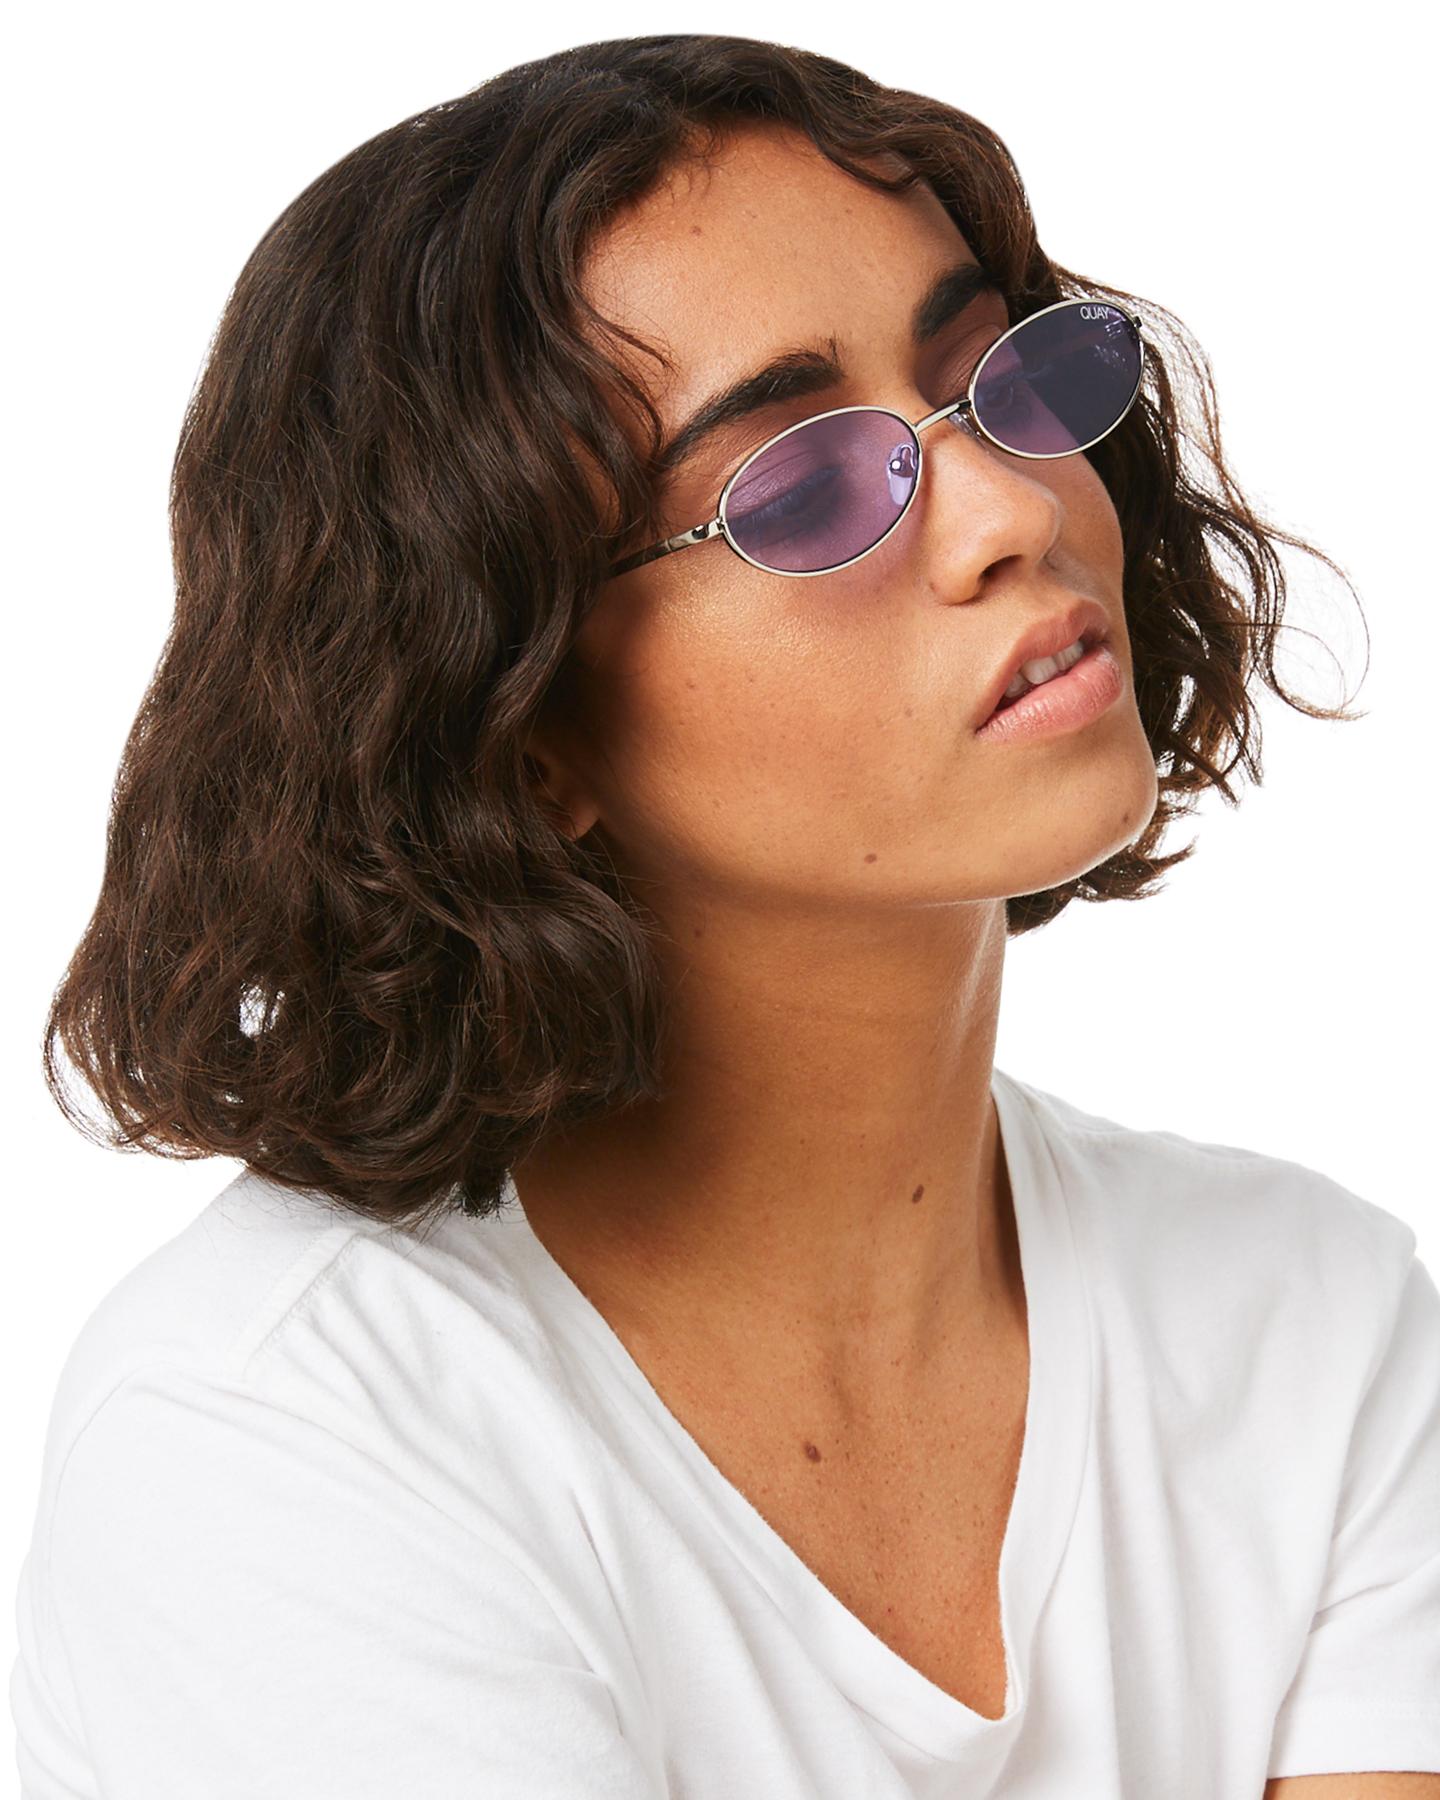 33192526c9 New Quay Eyewear Women s Clout X Alissa Violet Sunglasses Silver